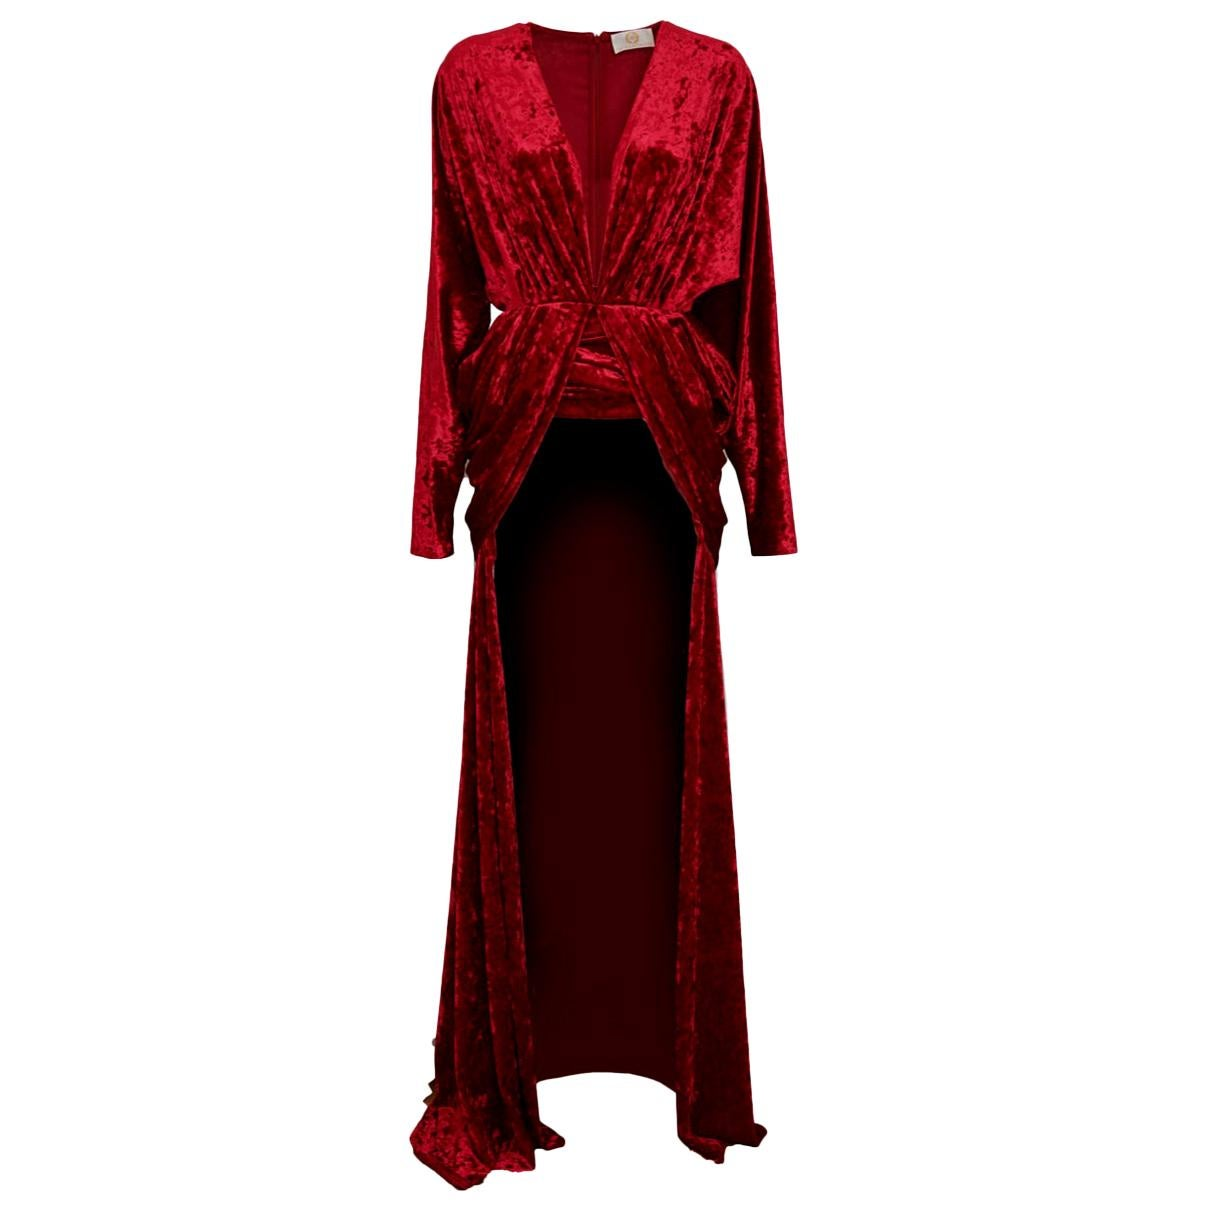 Sara Battaglia Red Velvet High Low Dress